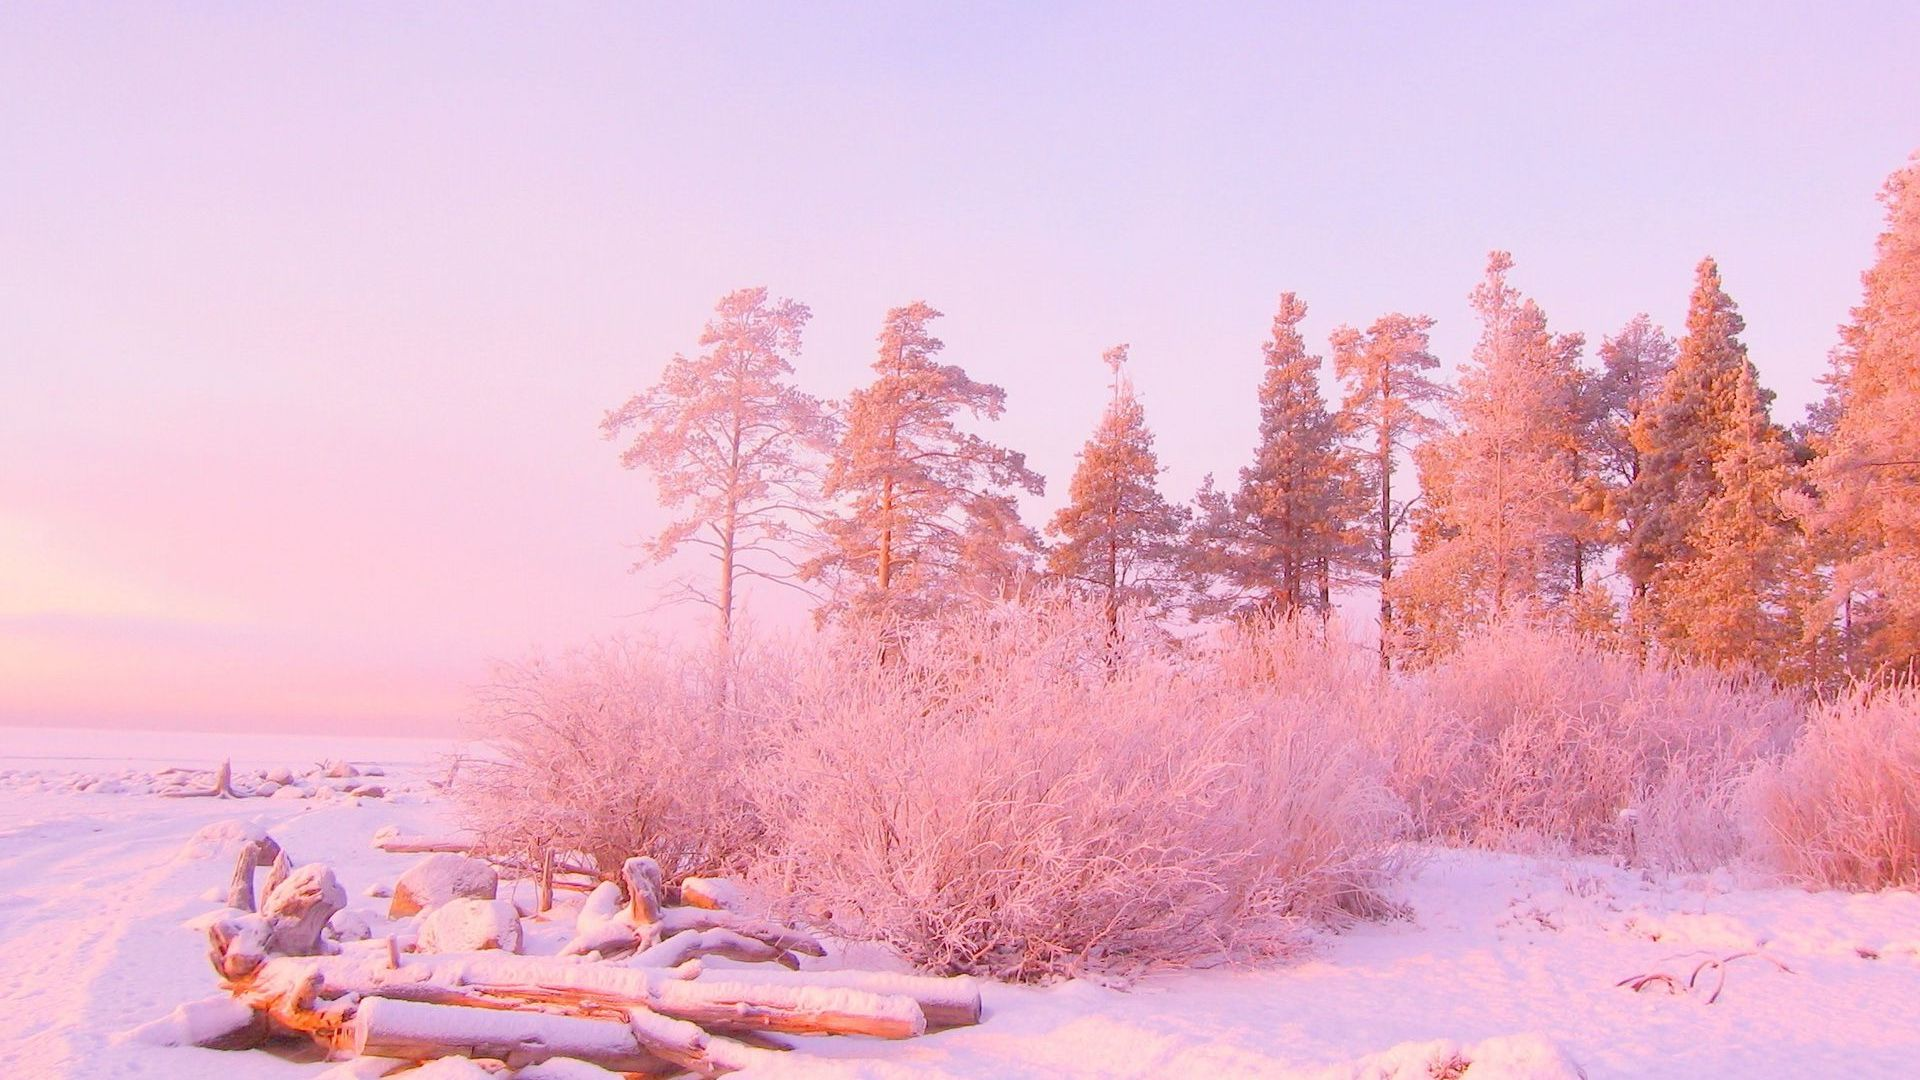 Pink sunset light over snowy forest Wallpaper 10228 1920x1080